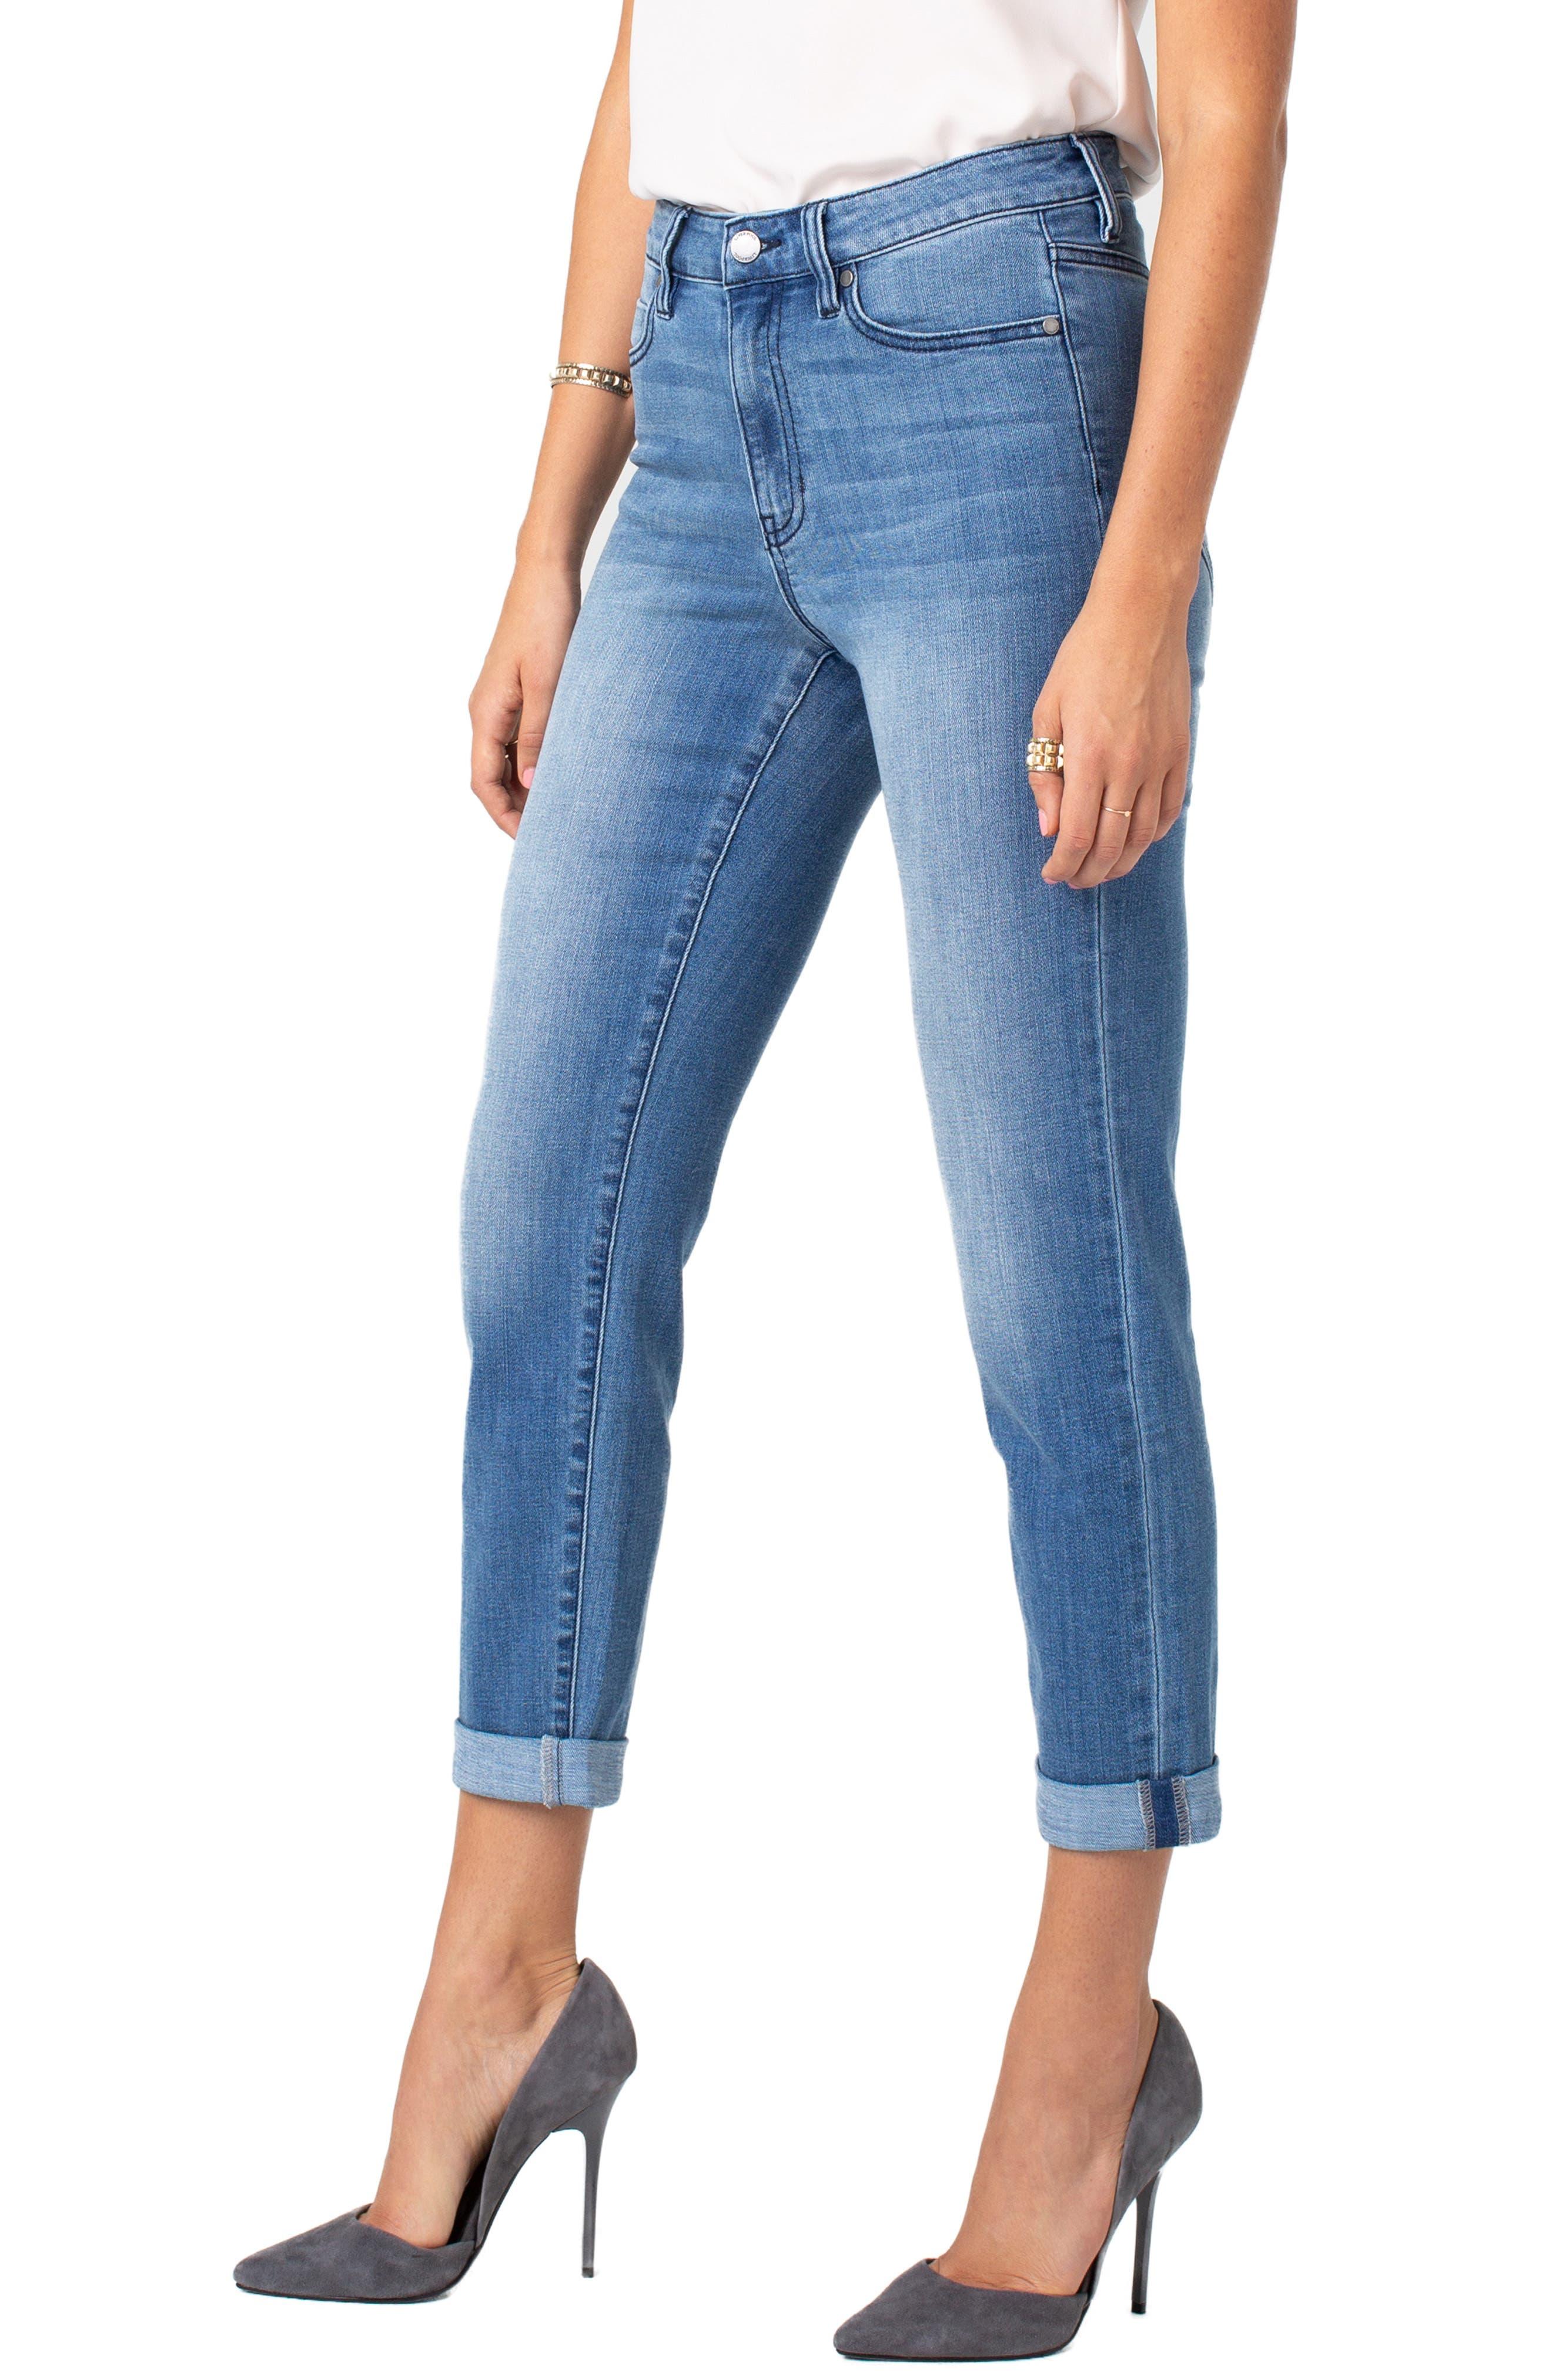 LIVERPOOL Marley High Waist Girlfriend Jeans, Main, color, CRESTLAKE